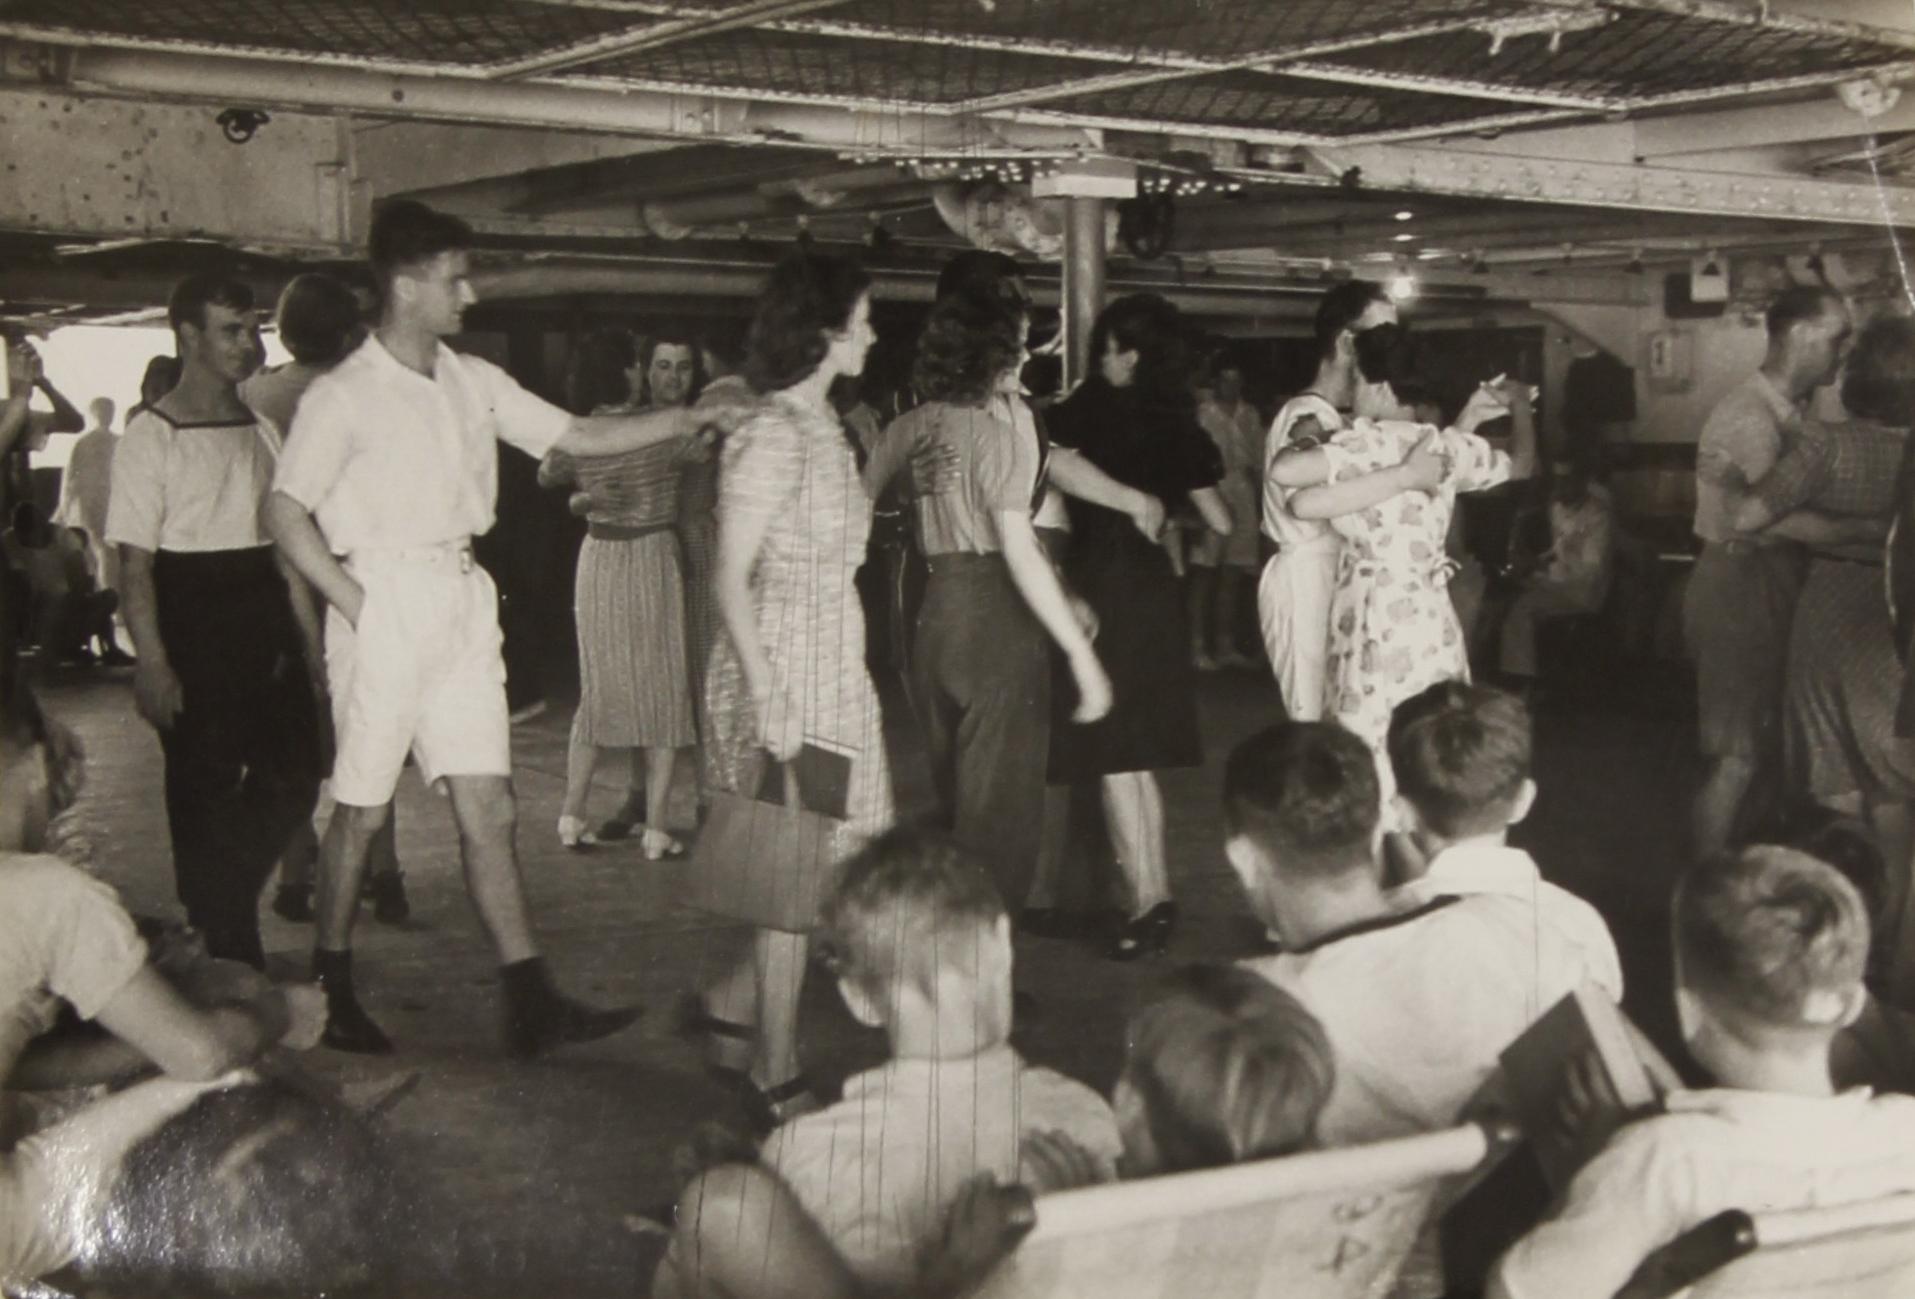 On the Boat to Ceylon (Sri Lanka)